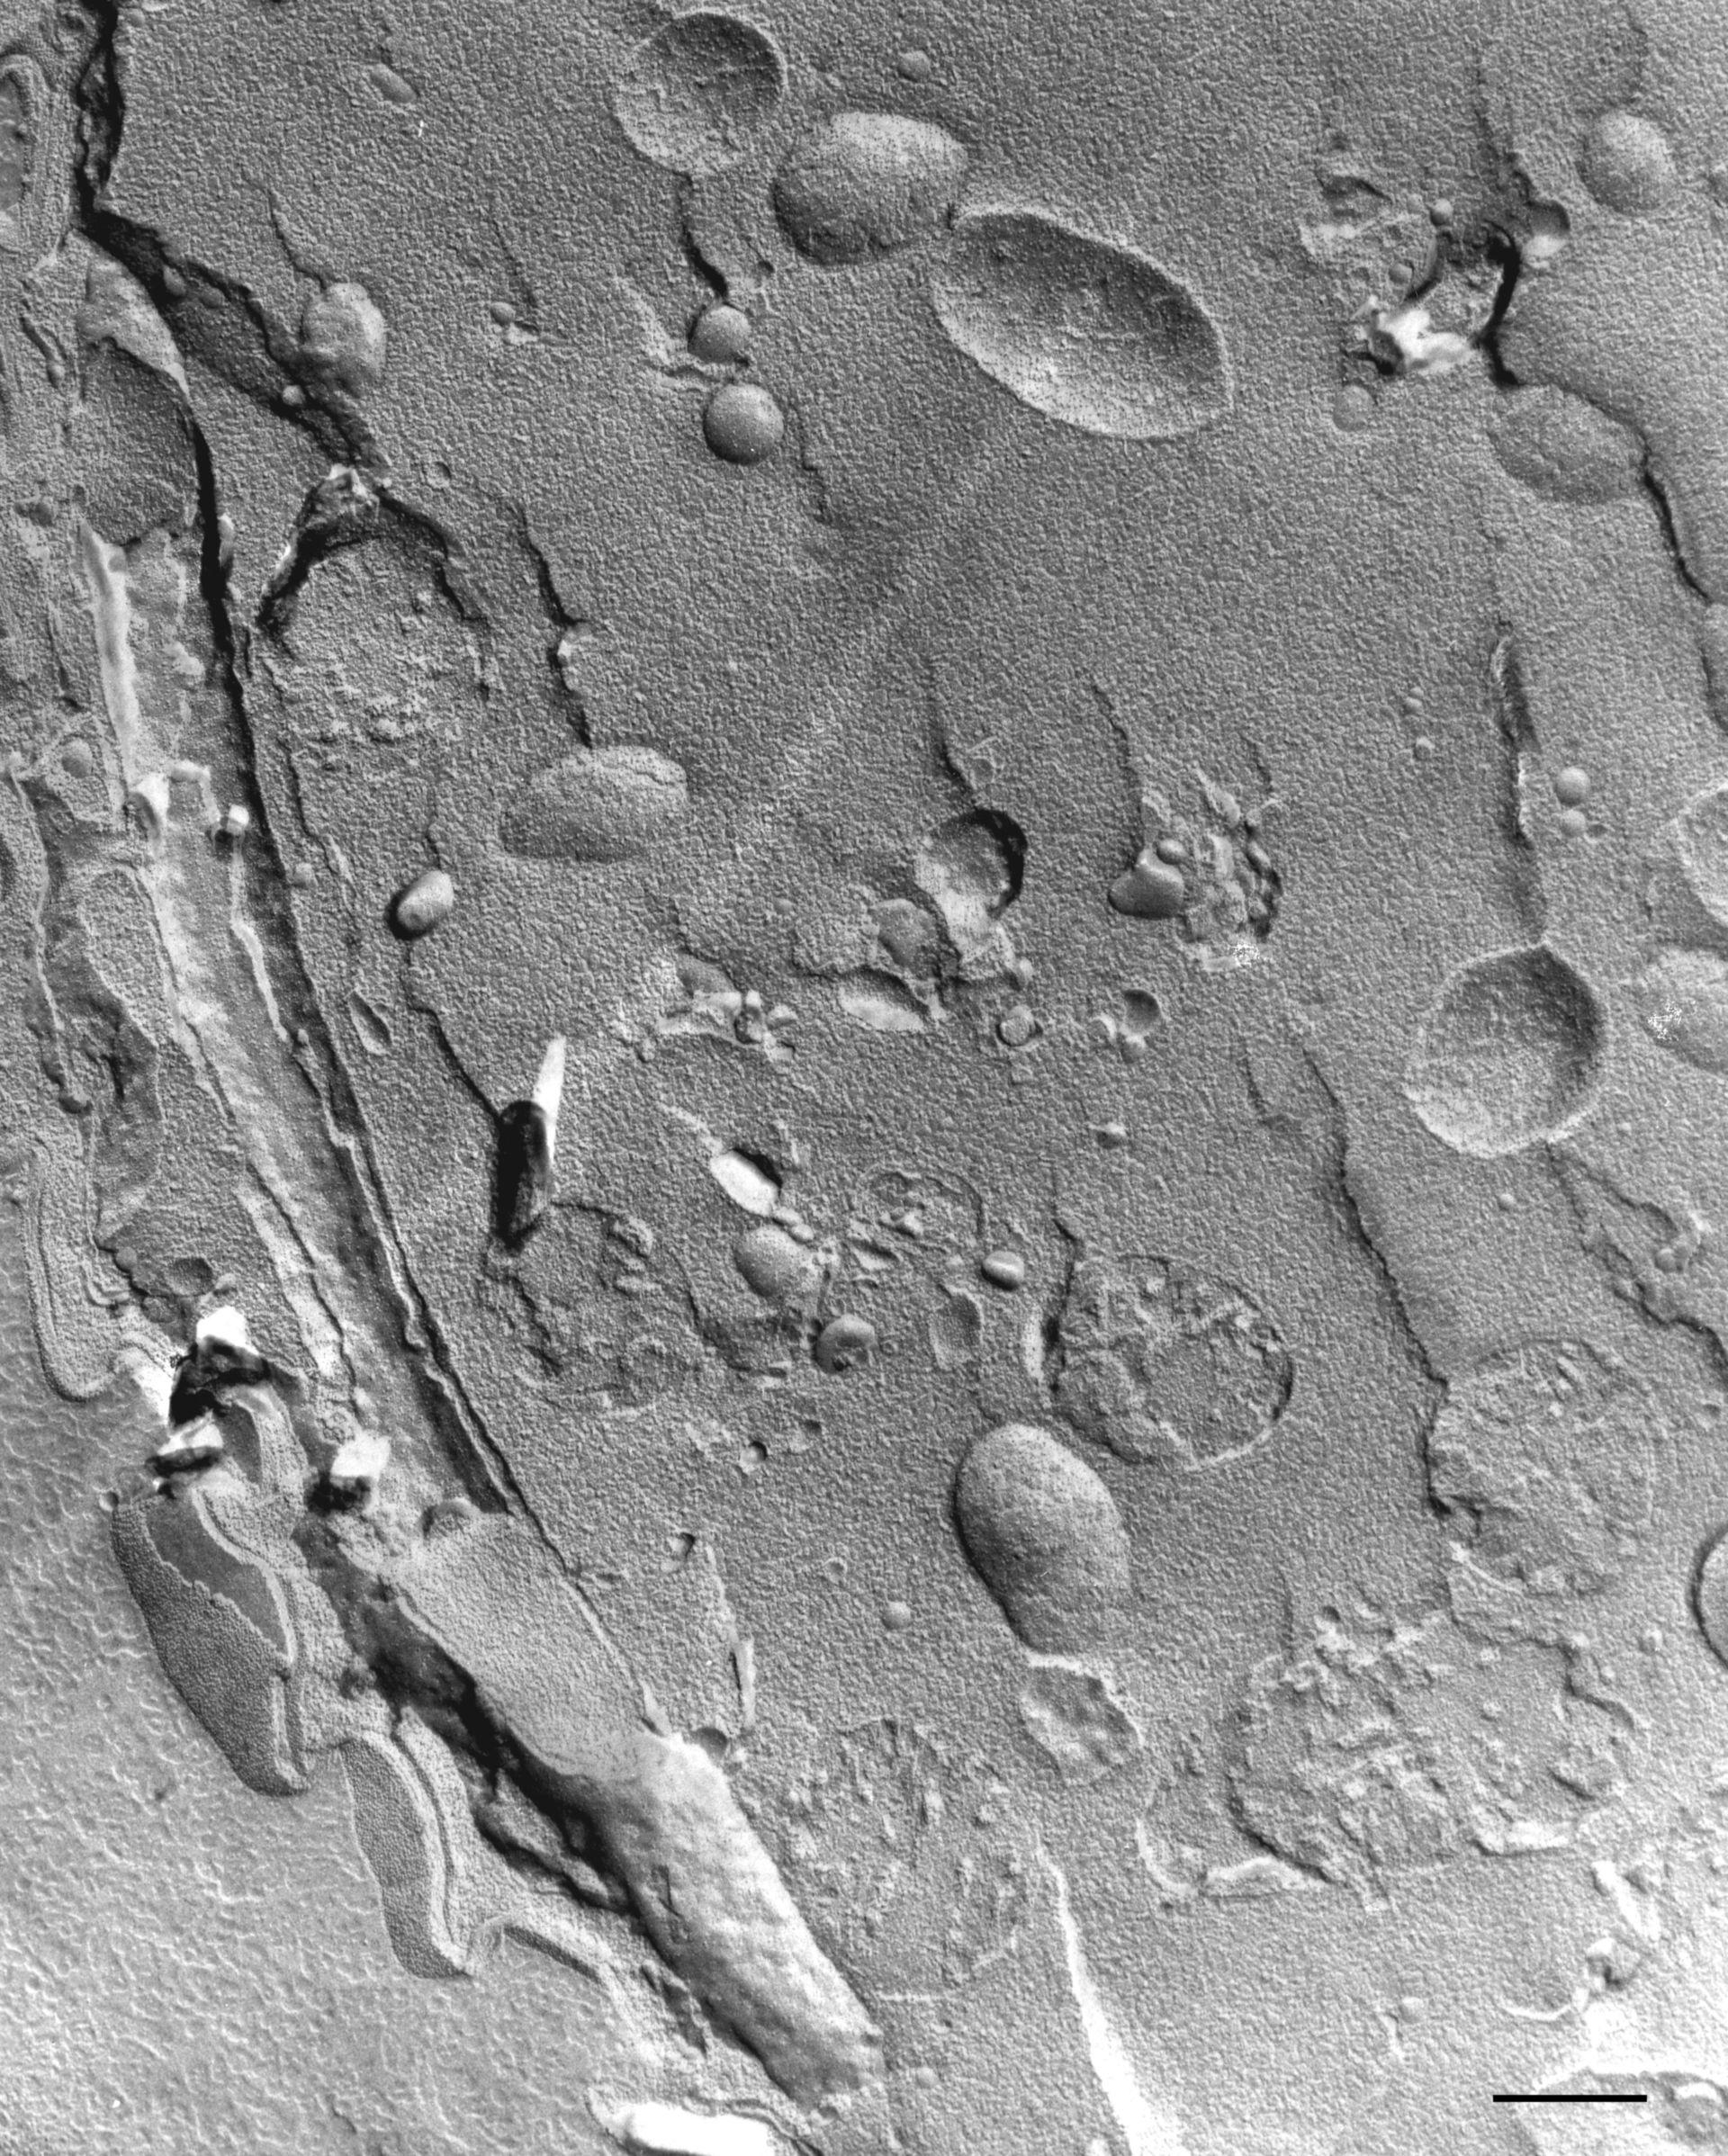 Vorticella microstoma (Cytoplasm) - CIL:36275